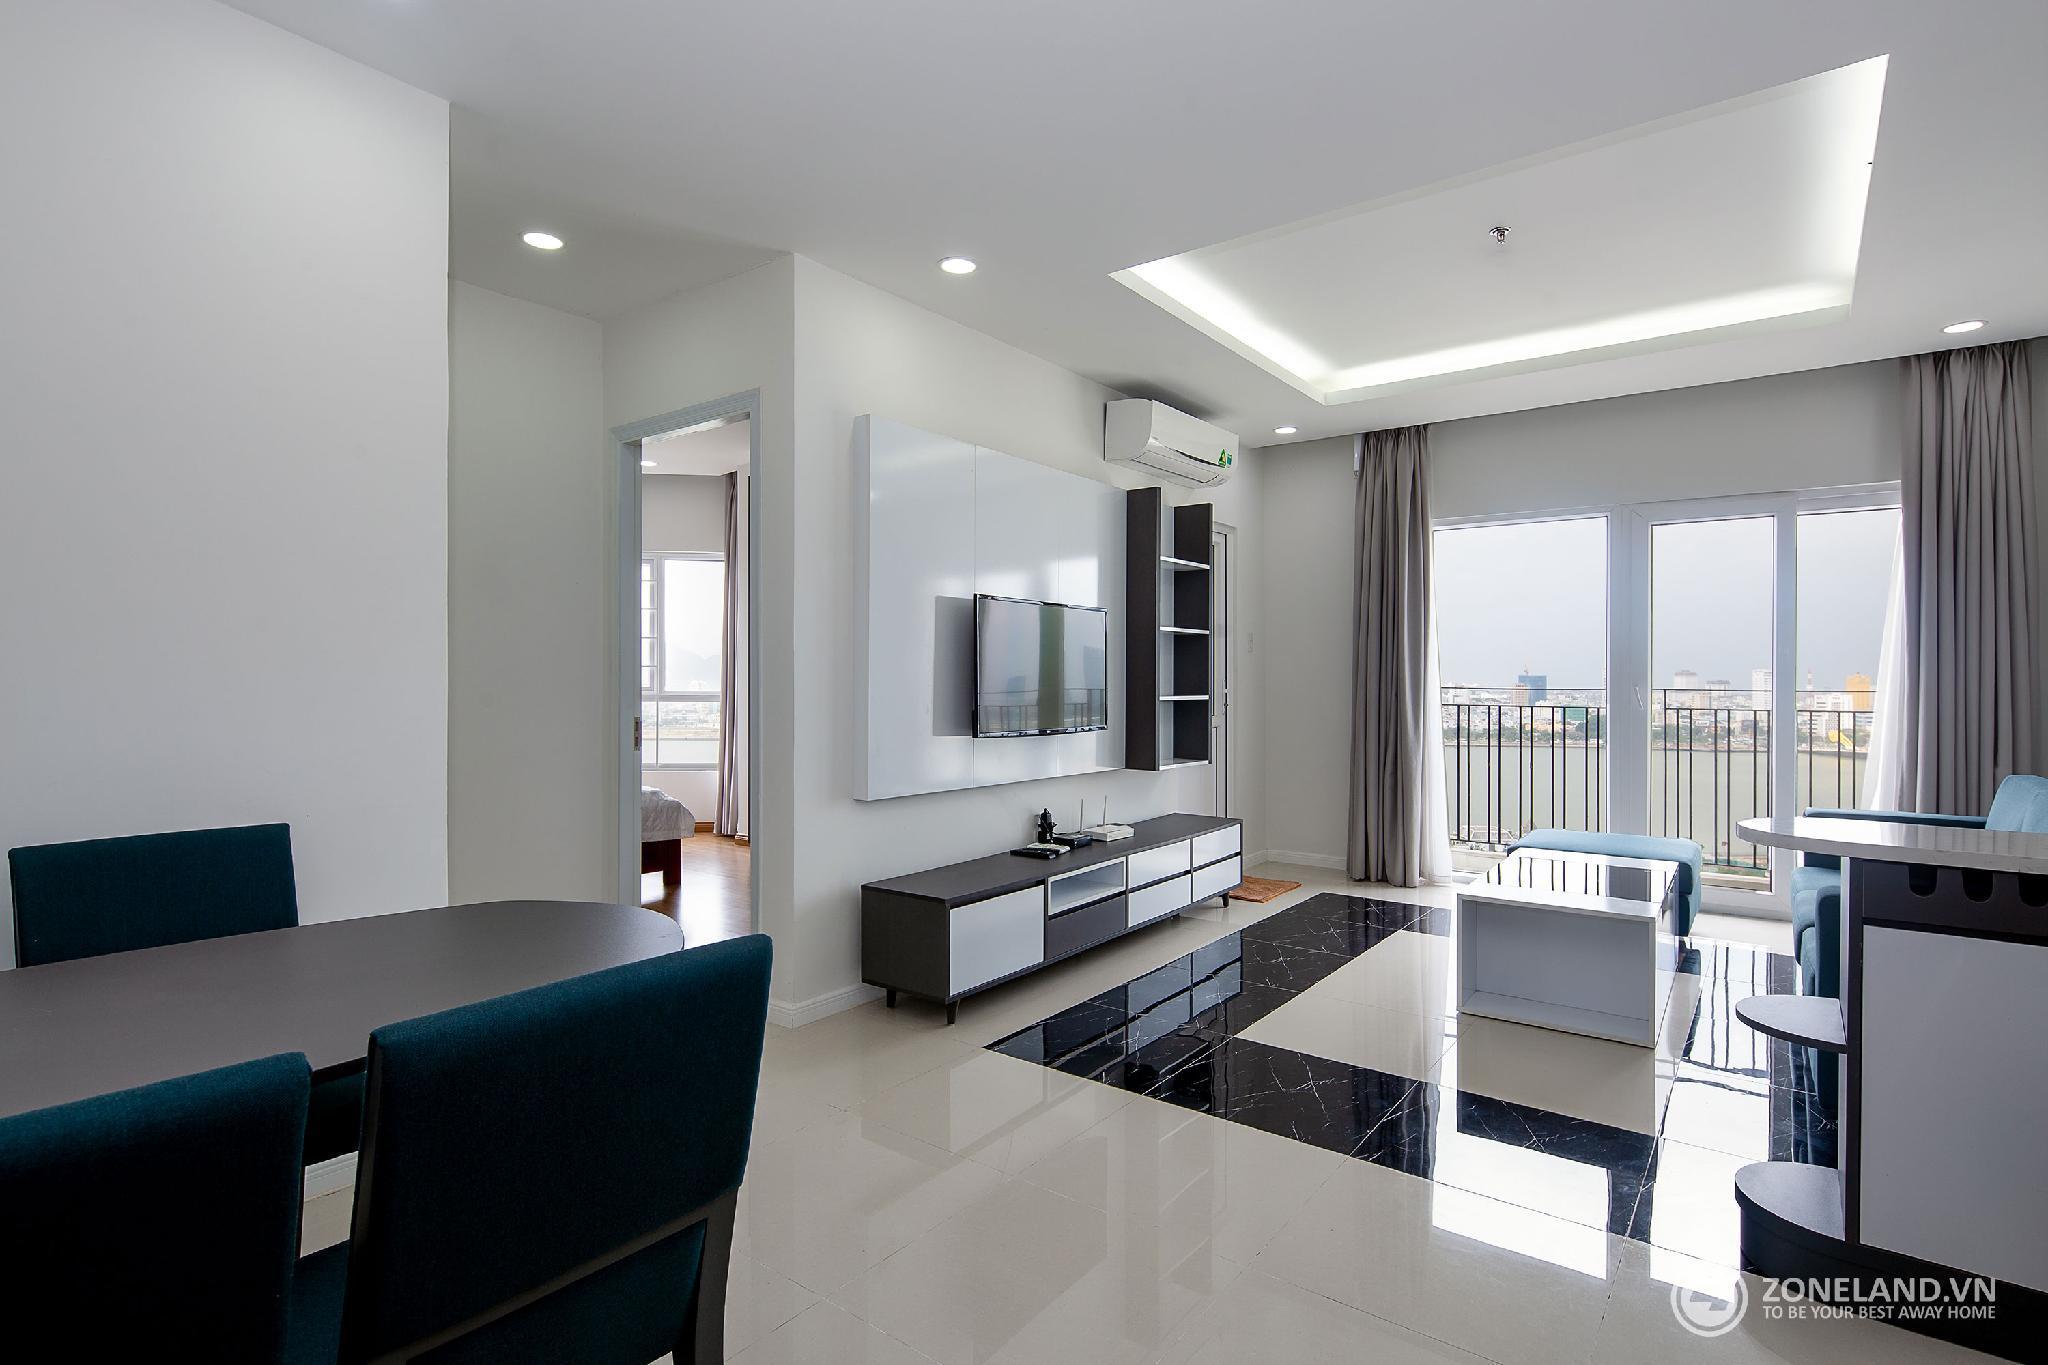 Zoneland Apartment - Monarchy Riverside, Sơn Trà